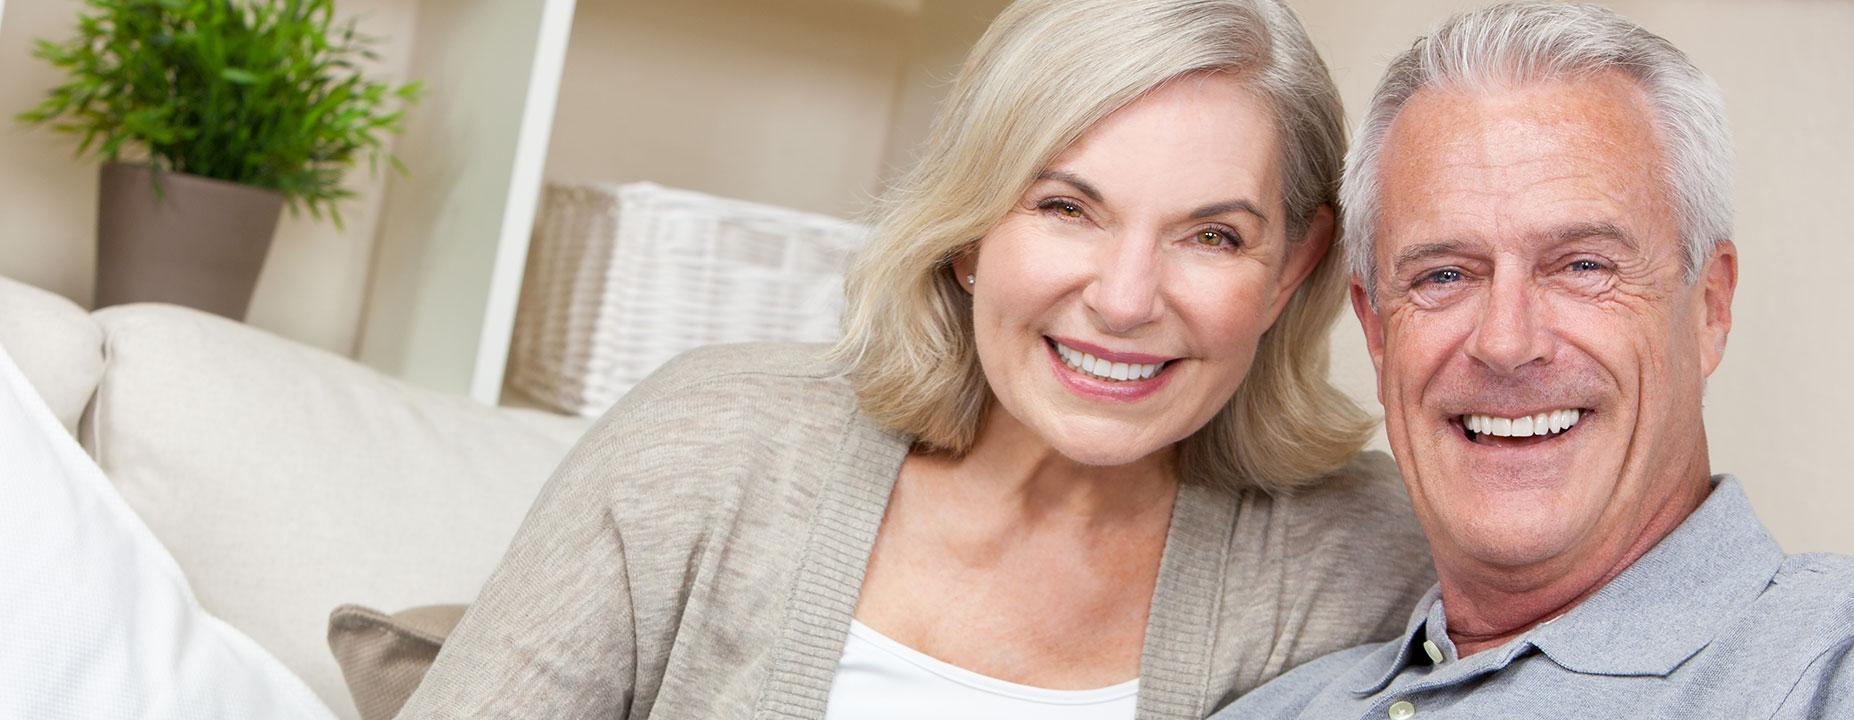 Middle age couple smiling after having restorative dental services